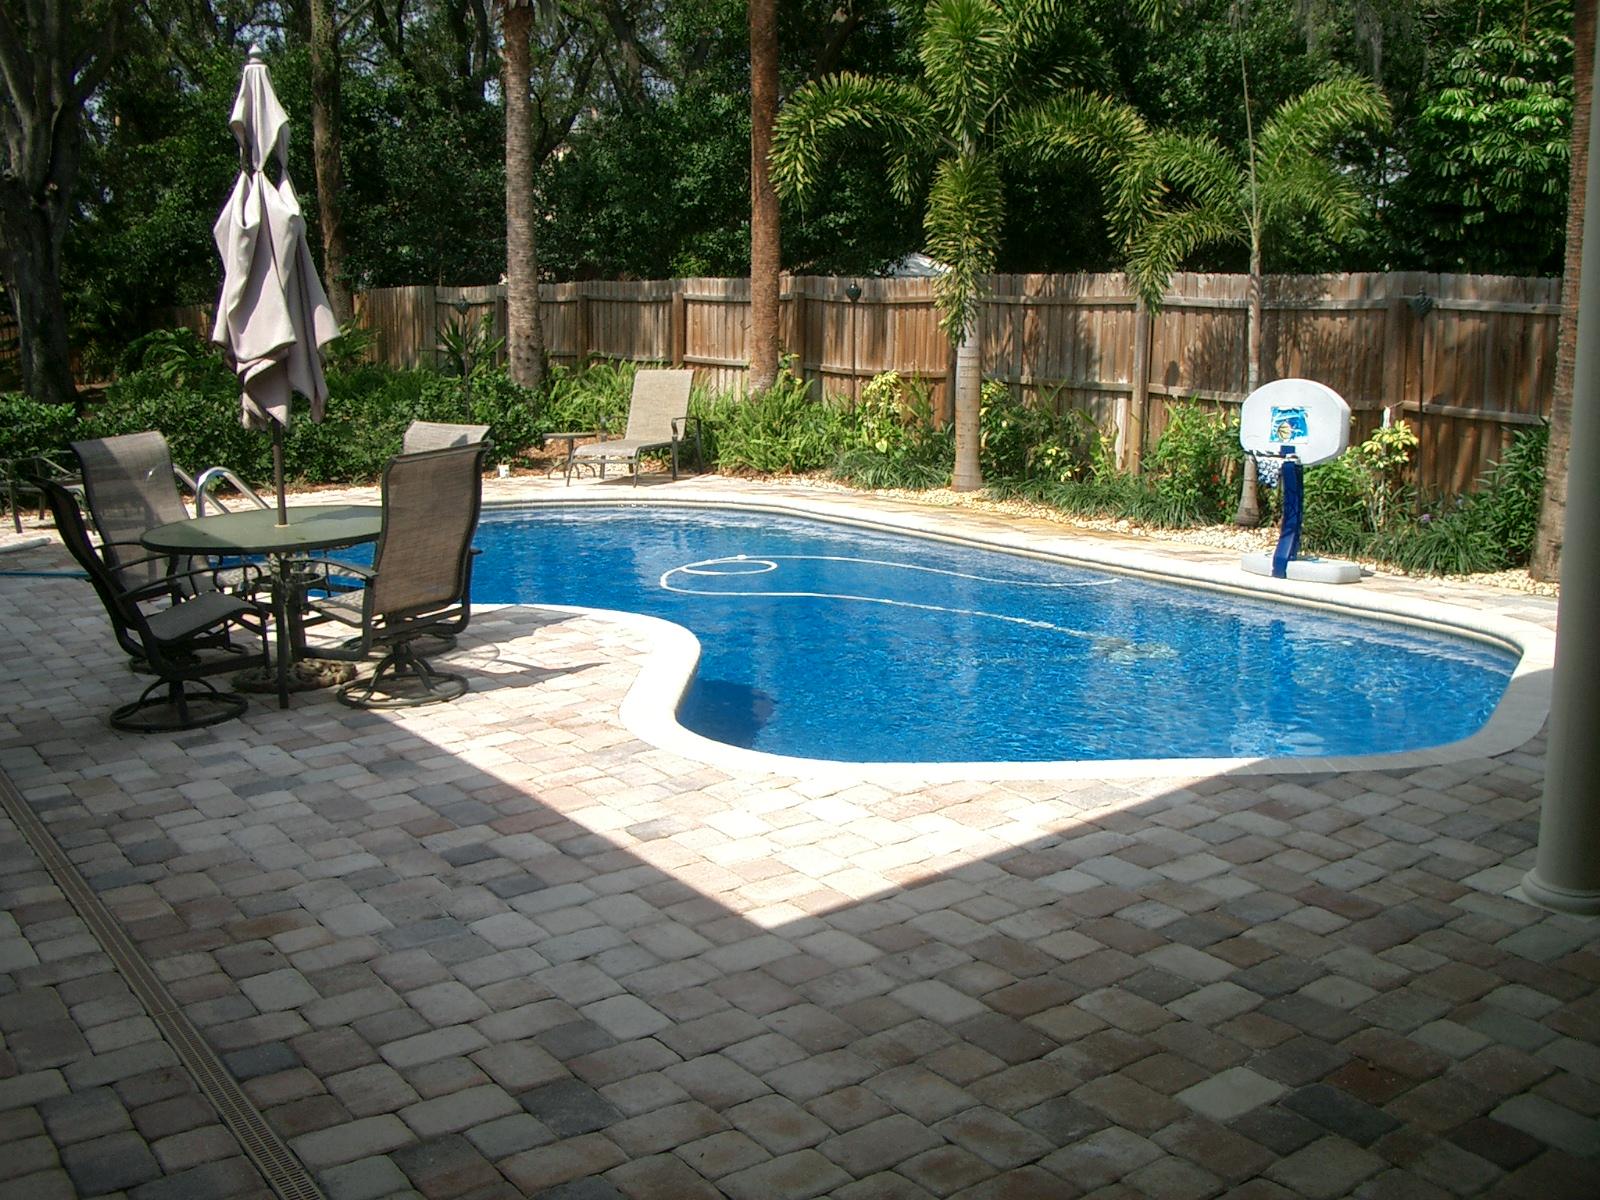 backyard pool designs photo - 1